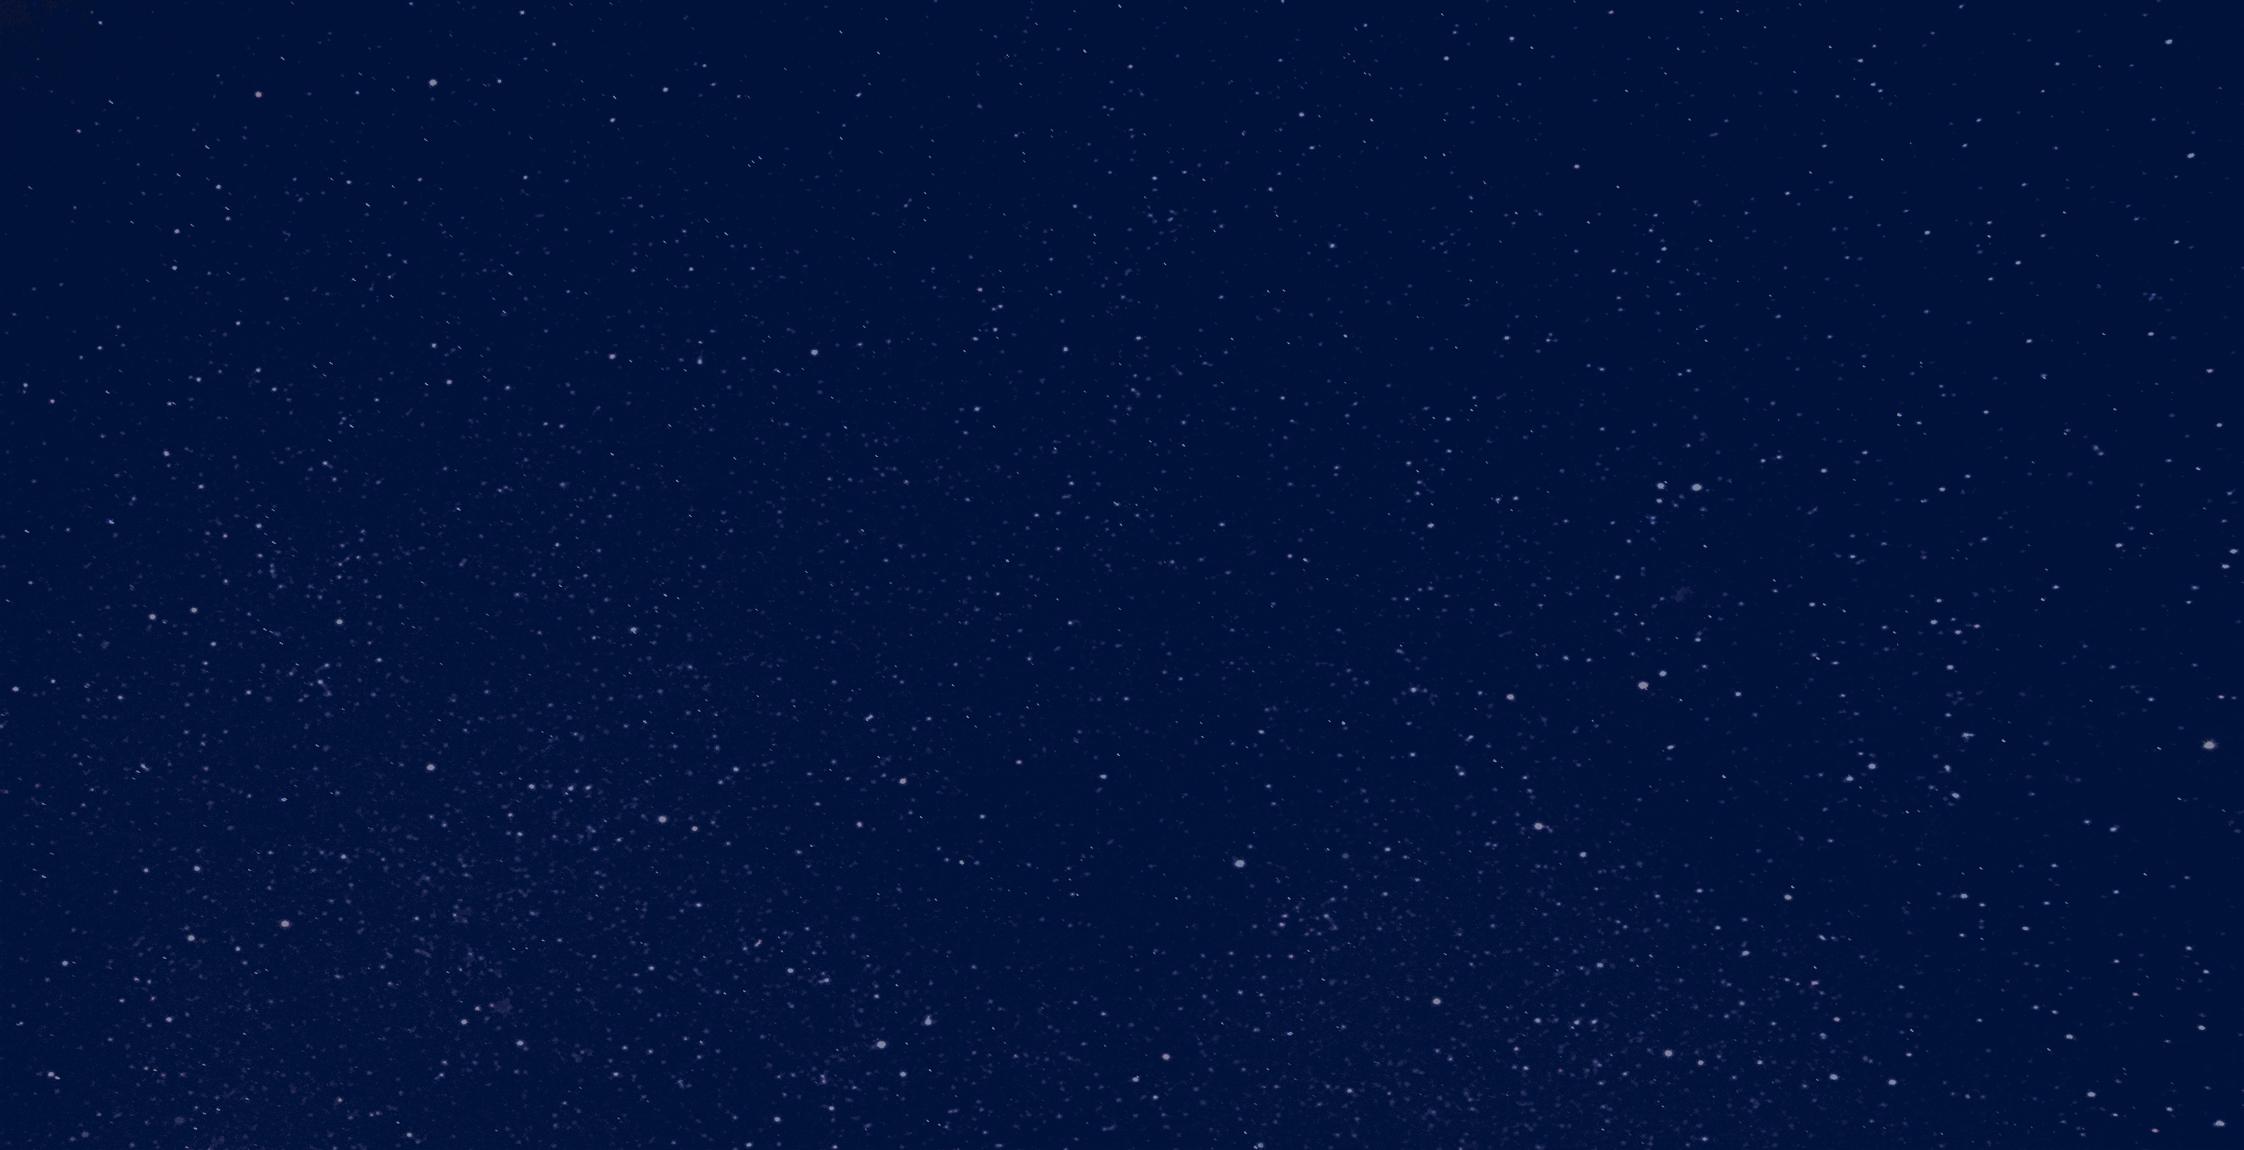 cielo stellato rielab mr 3